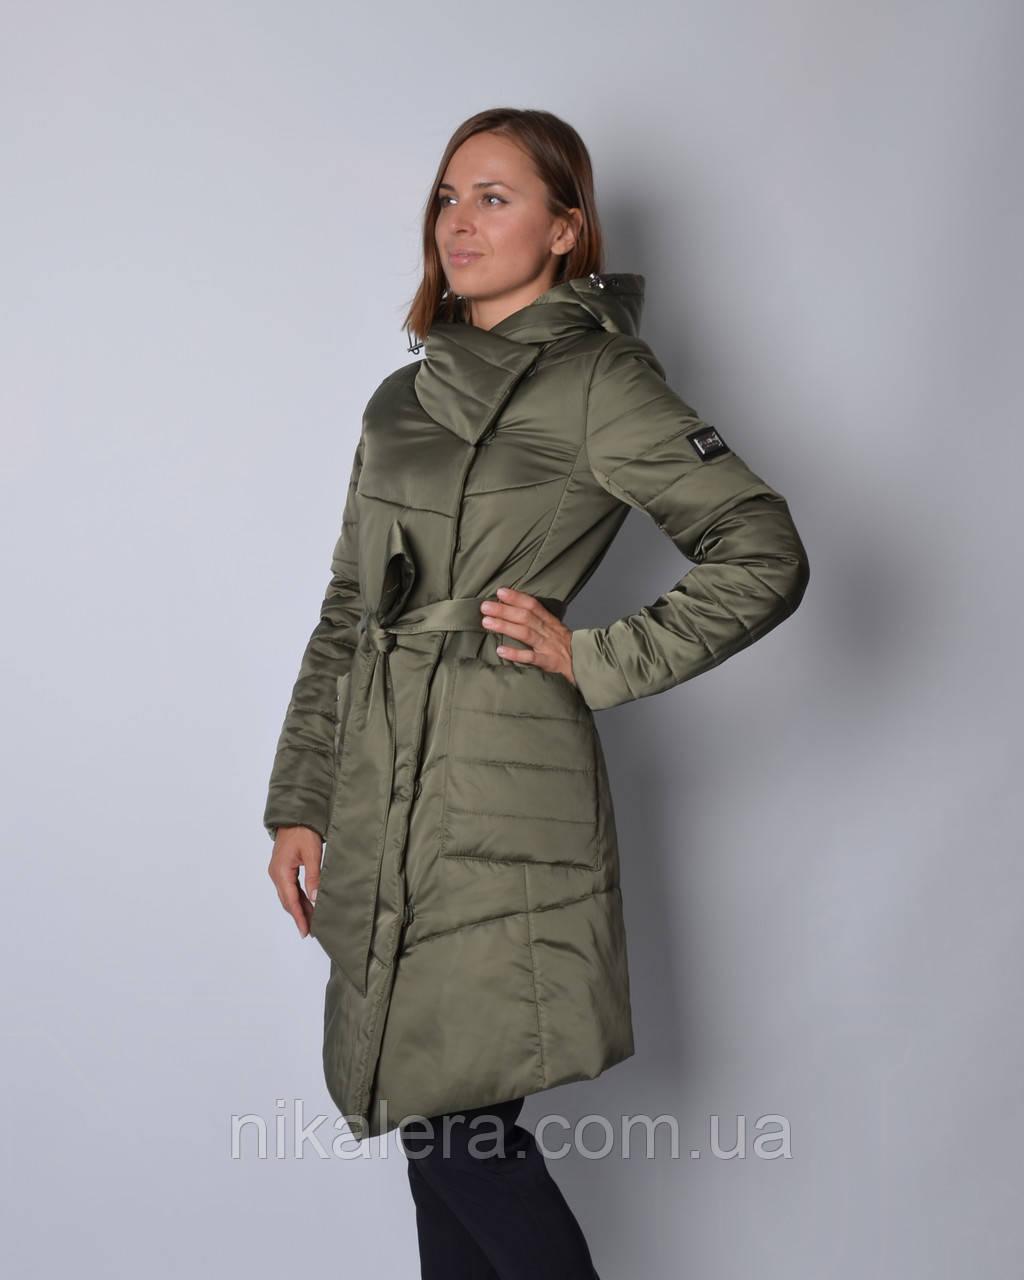 Куртка-одеяло демисезон,из атласа рр 50,52,54